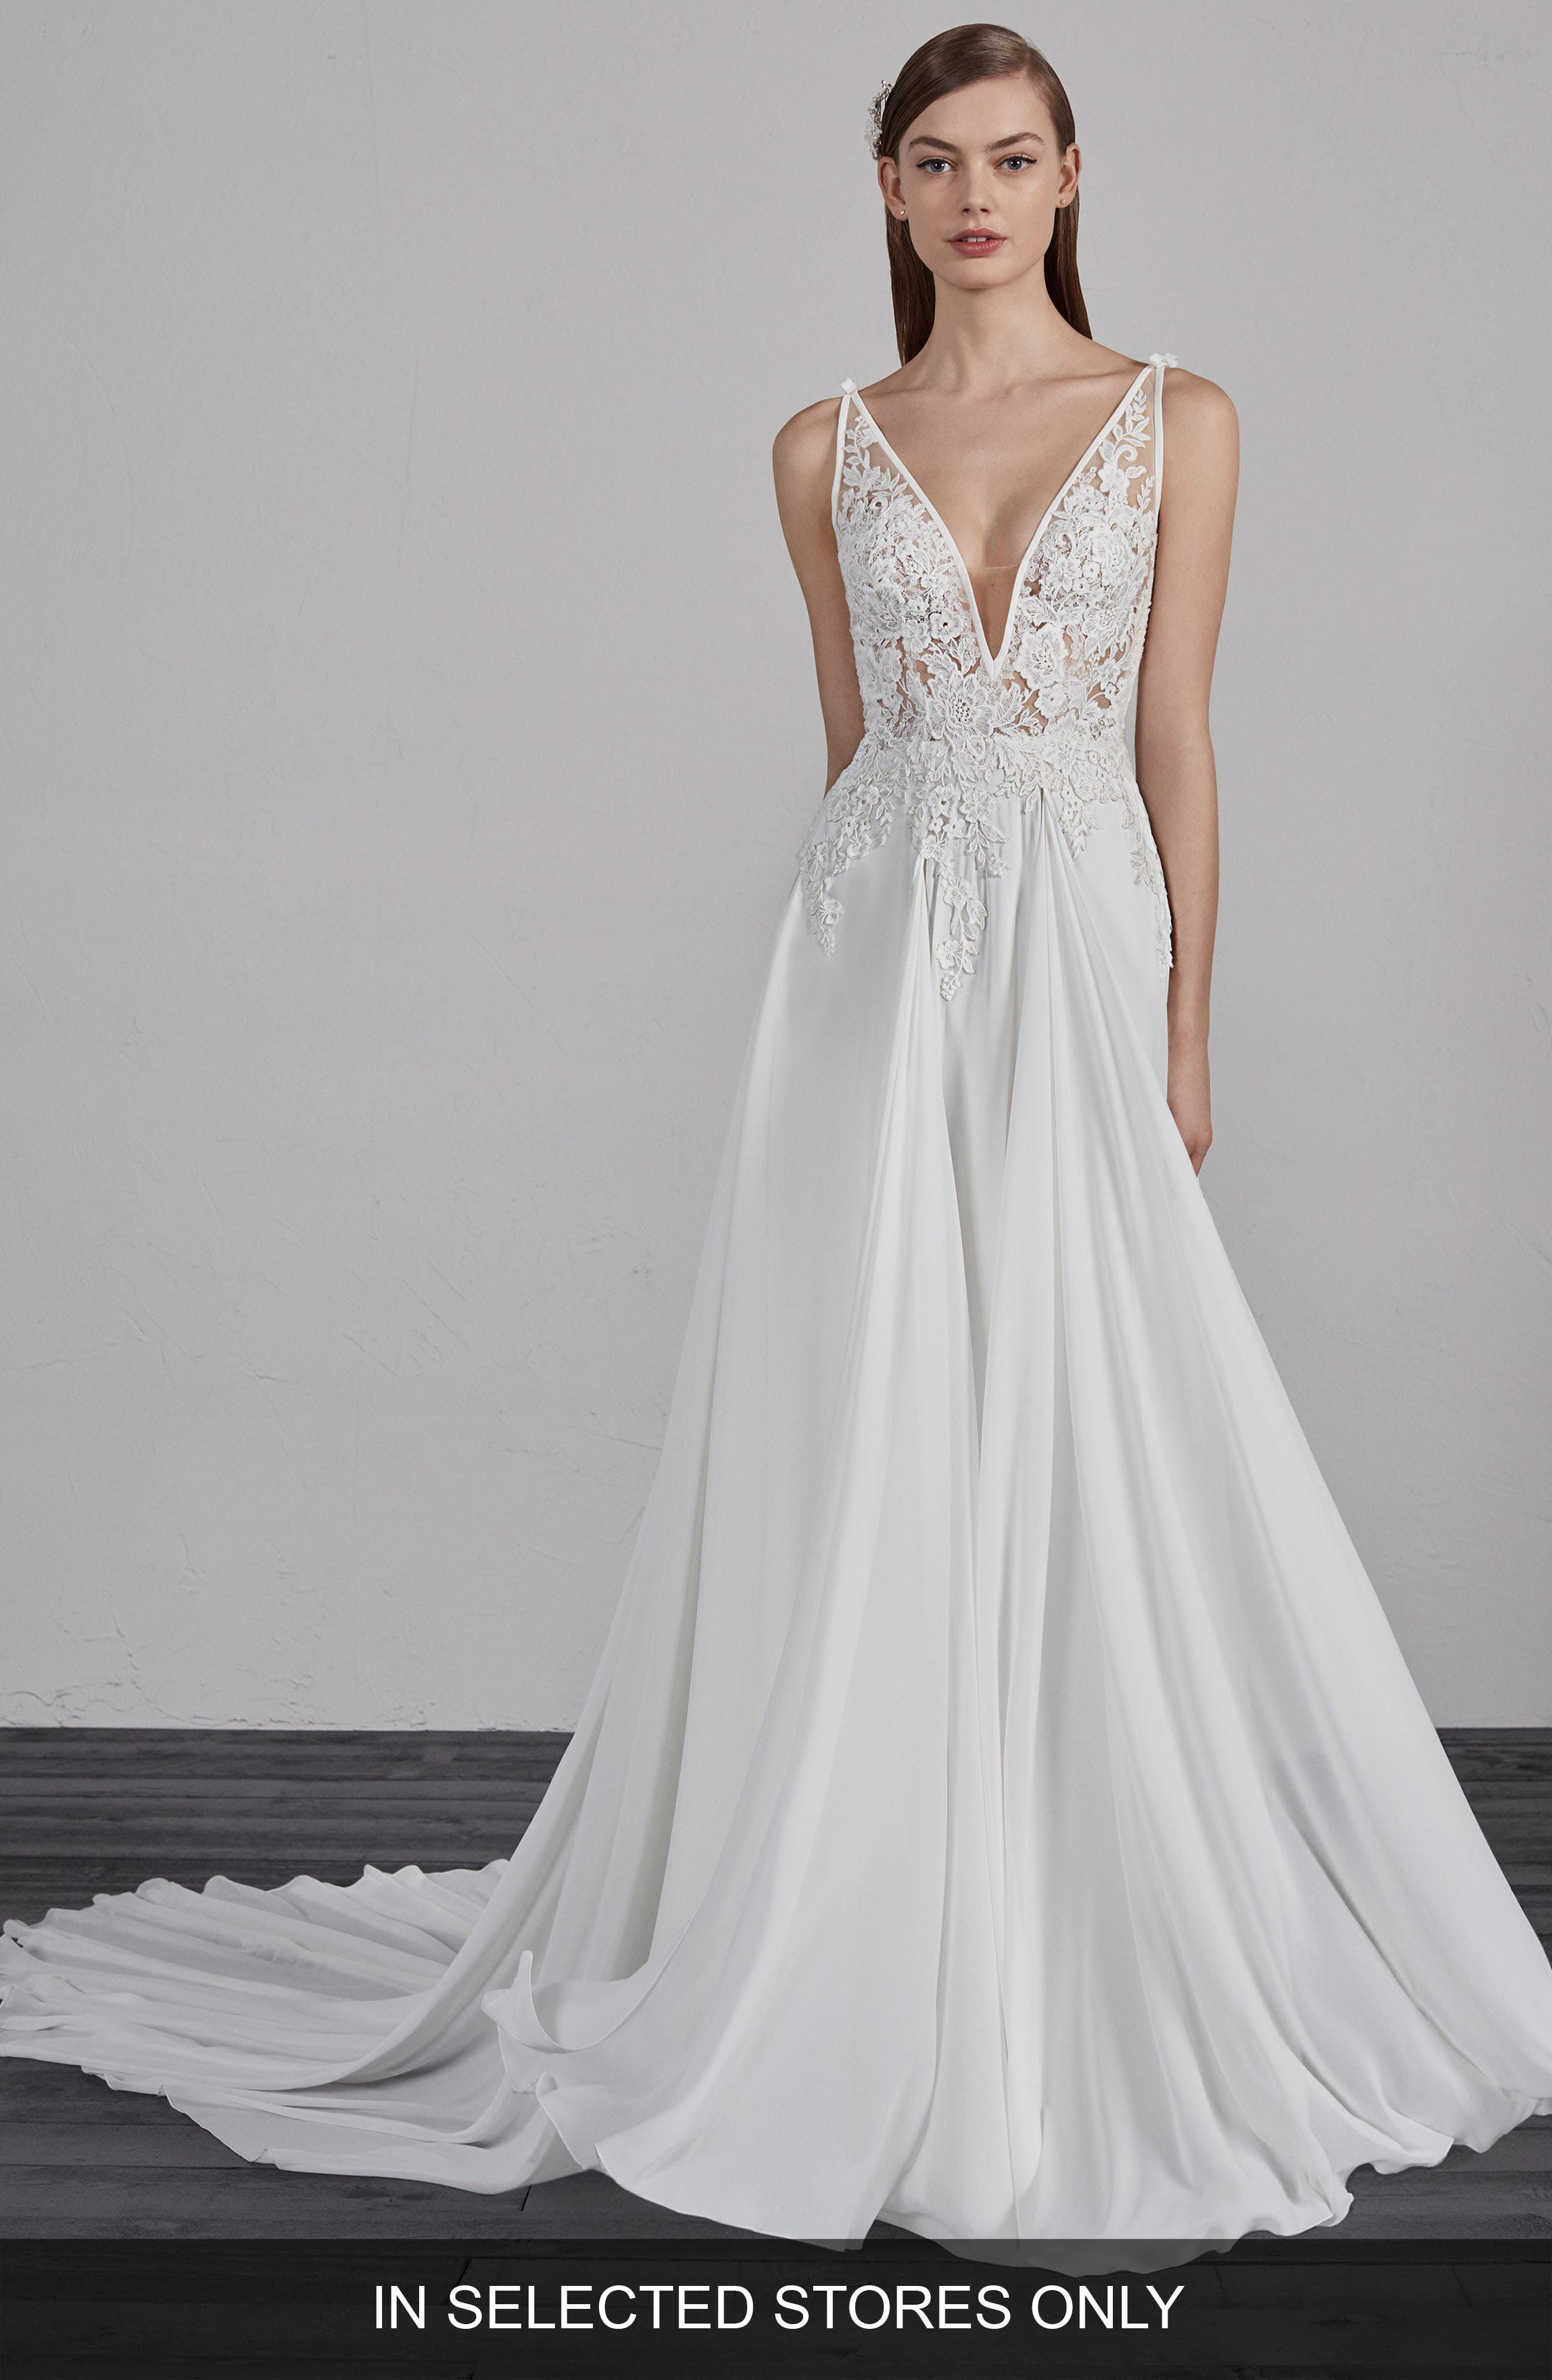 Escala Illusion Back A-Line Gown,                         Main,                         color, OFF WH/ CRST